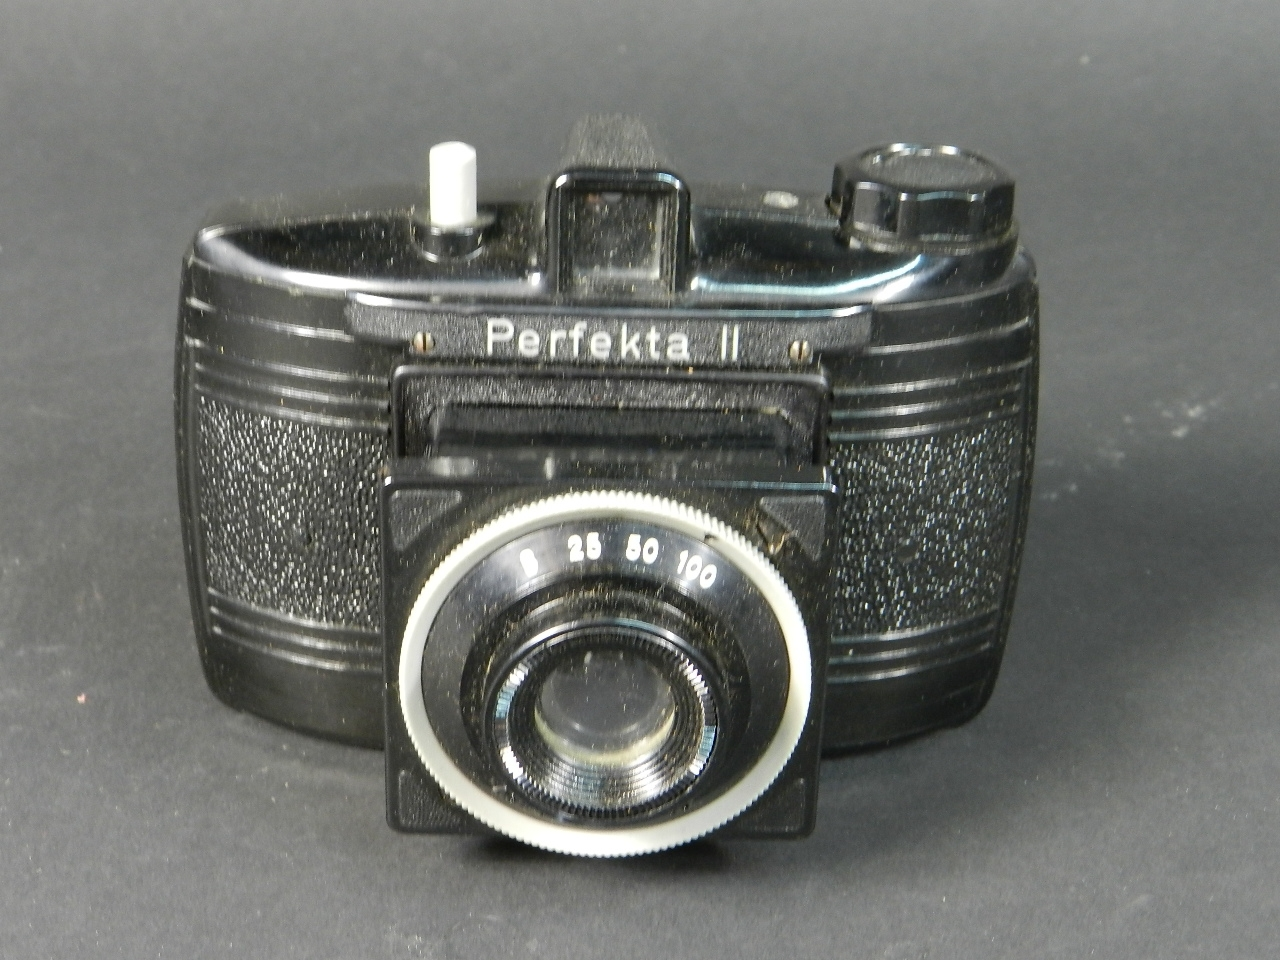 Imagen PERFEKTA II AÑO 1955 38323